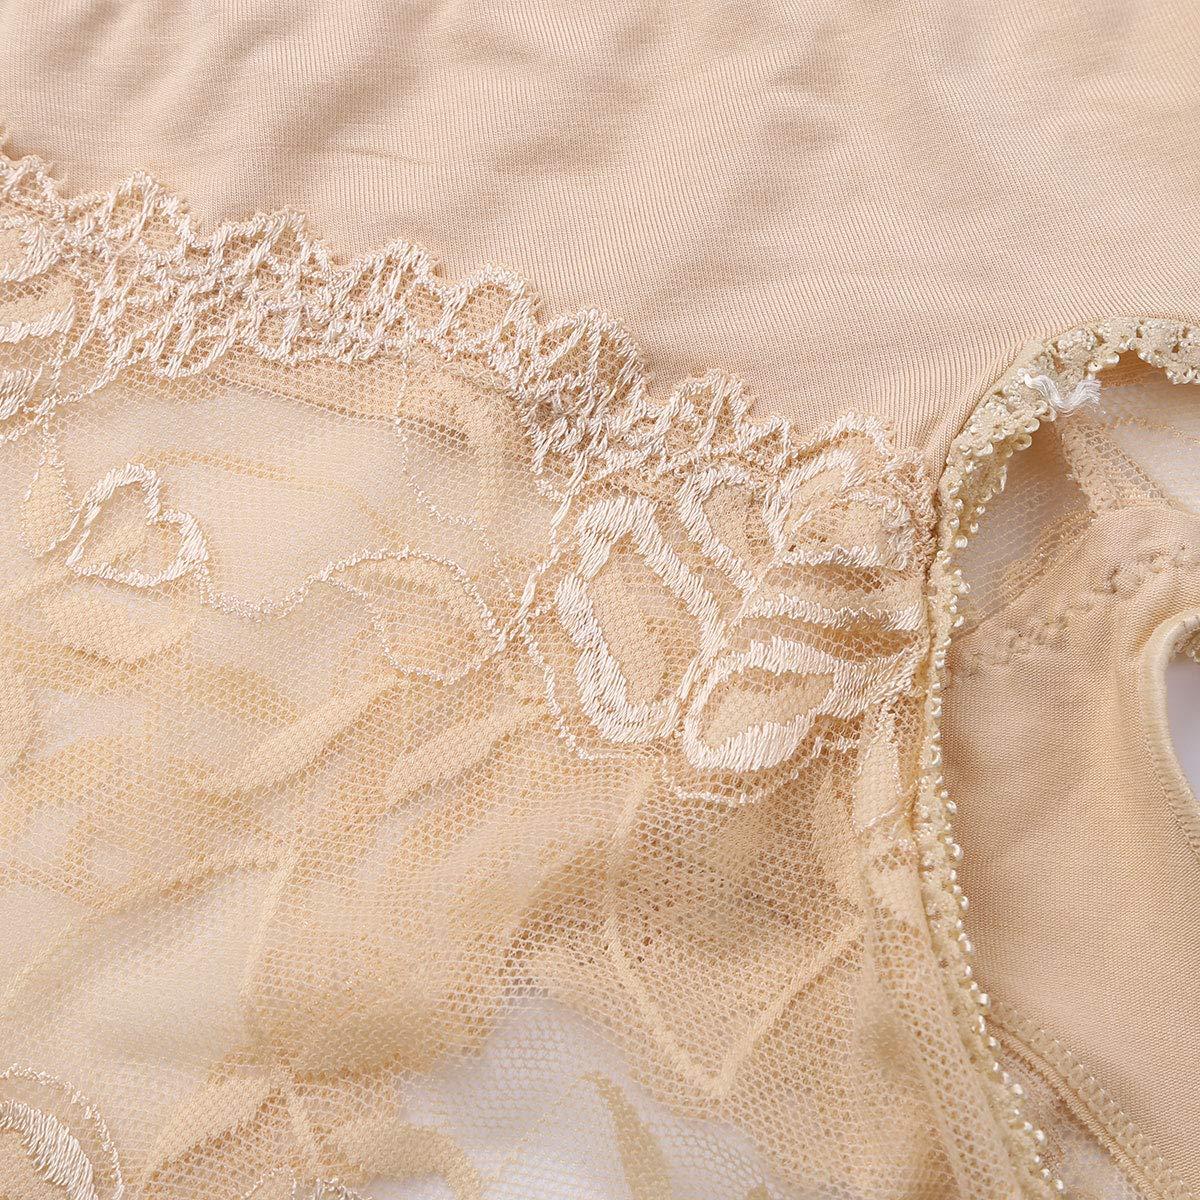 iiniim Mens Sissy Ruffles Lace Pouch Bikini Briefs French Maid Girly Panties Underwear